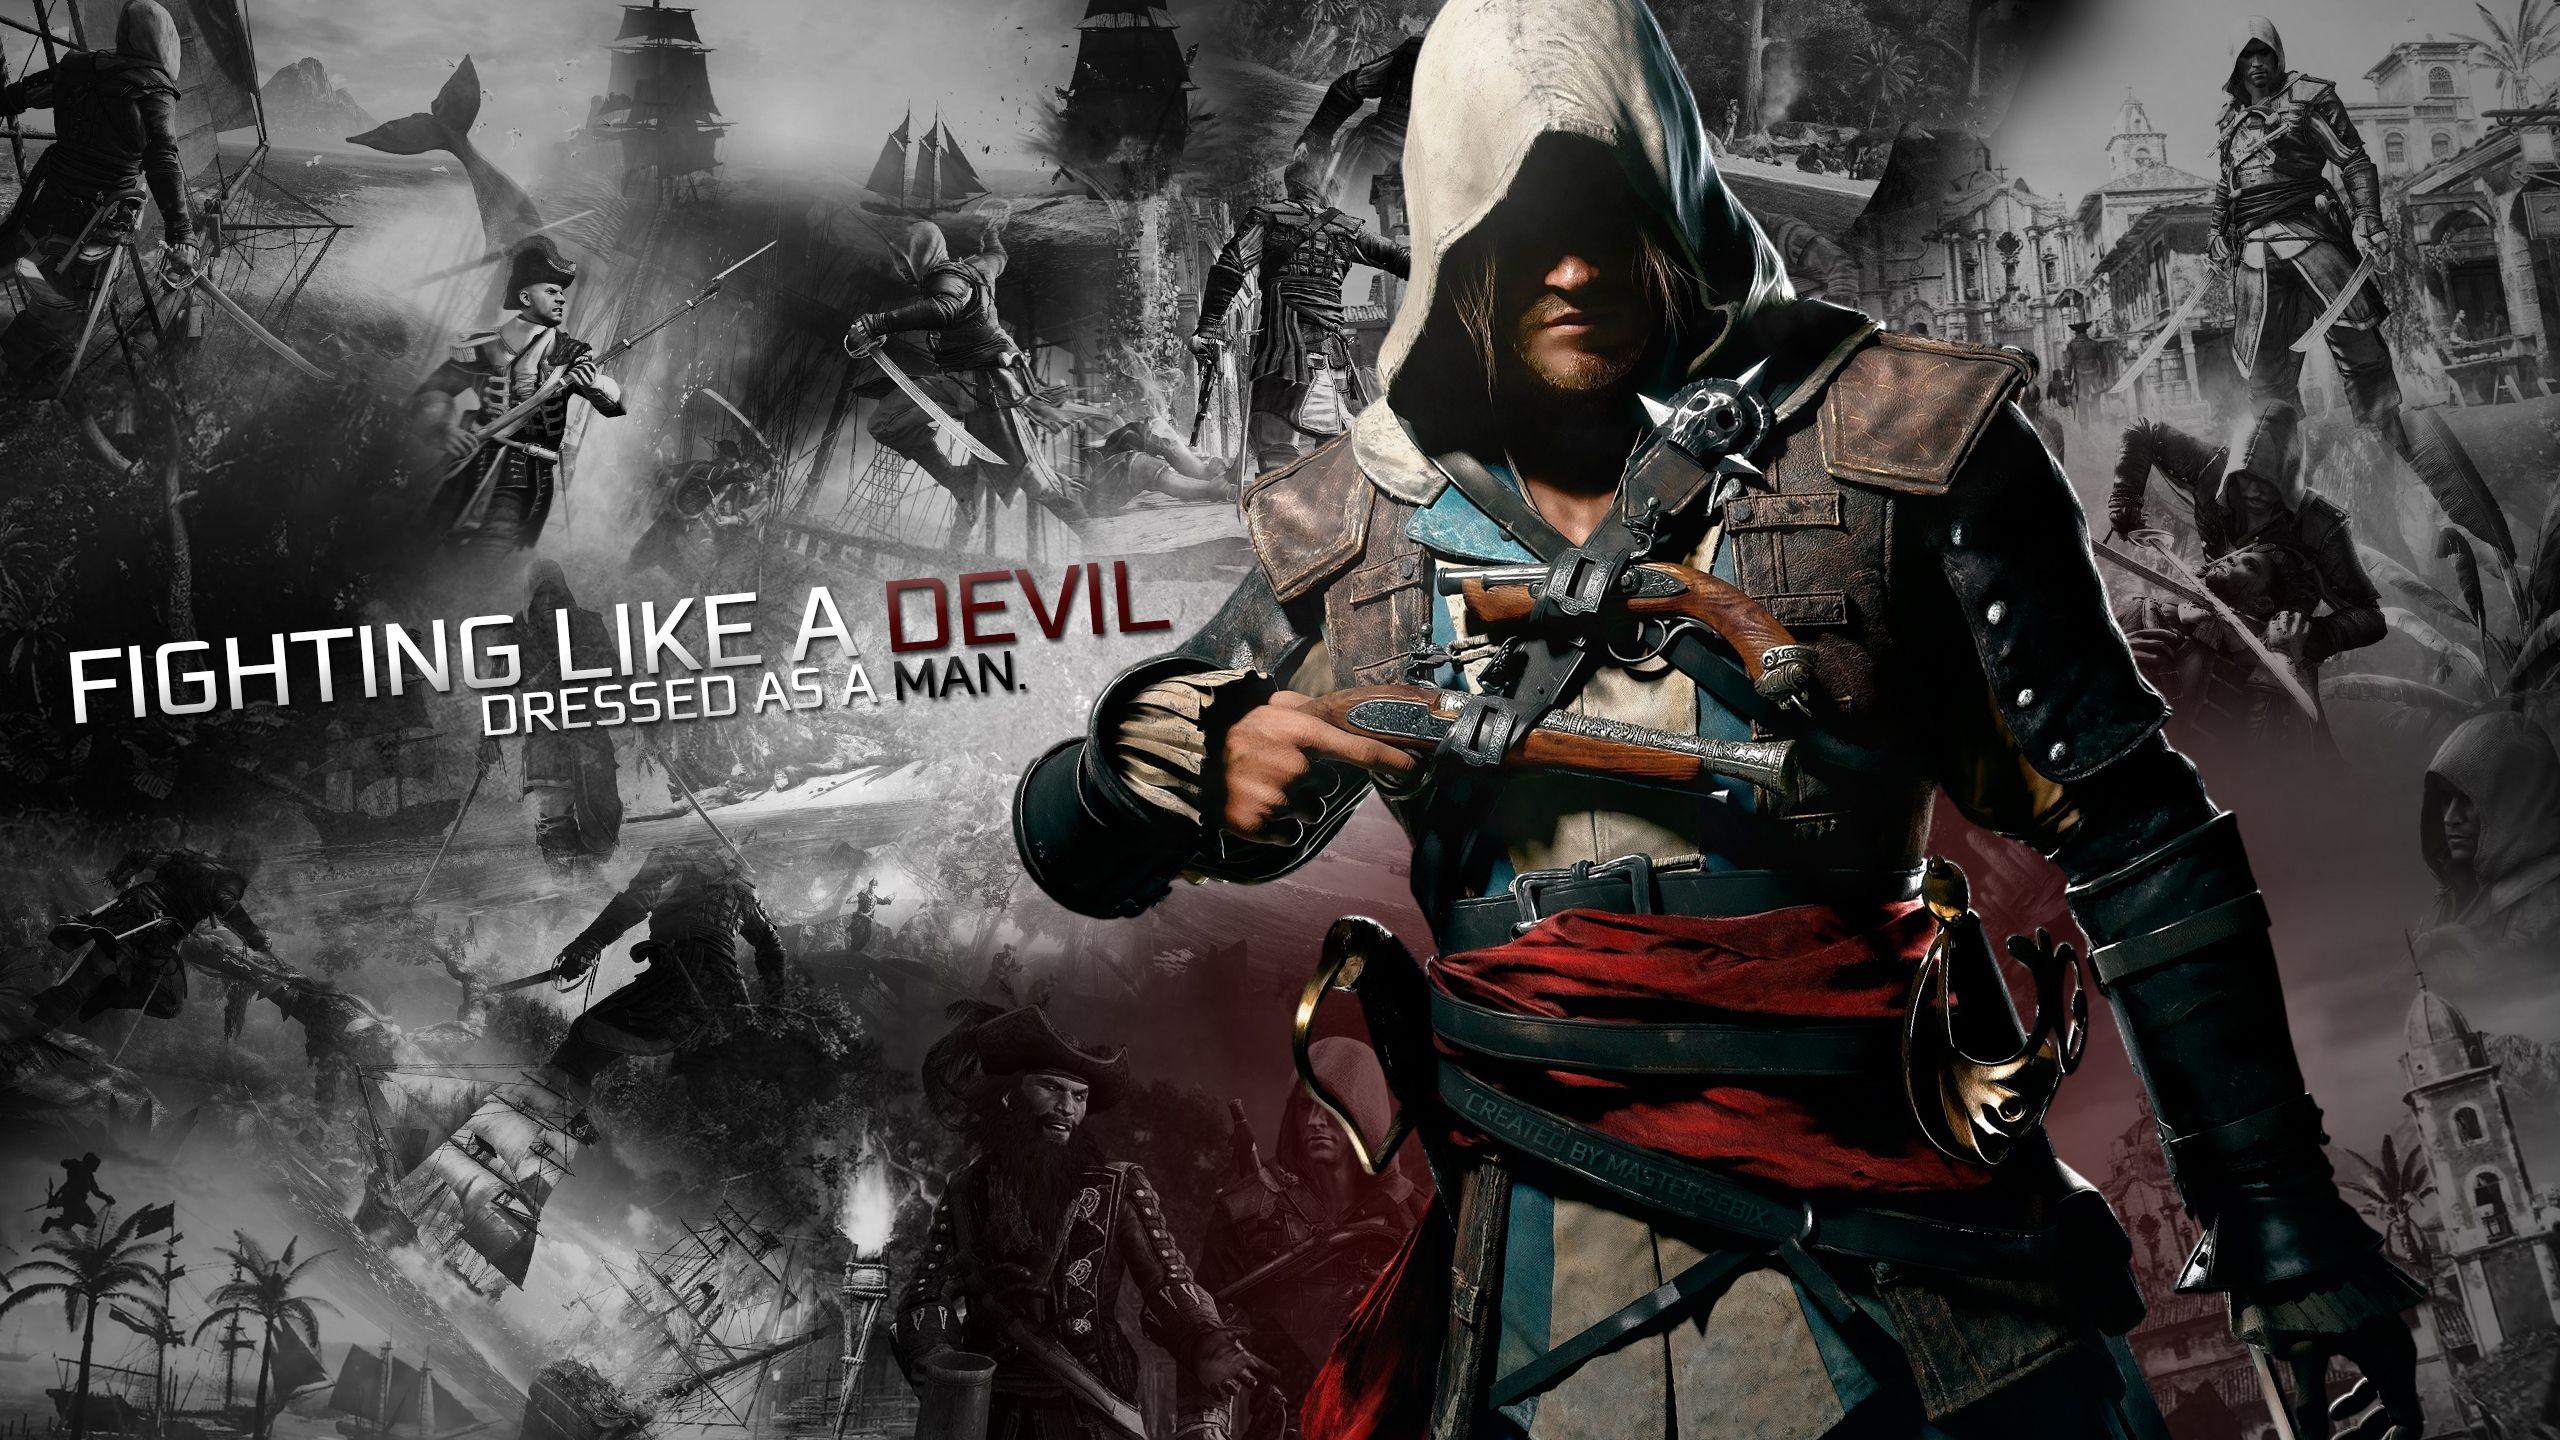 Assassins Creed IV Black Flag wallpaper Game wallpapers